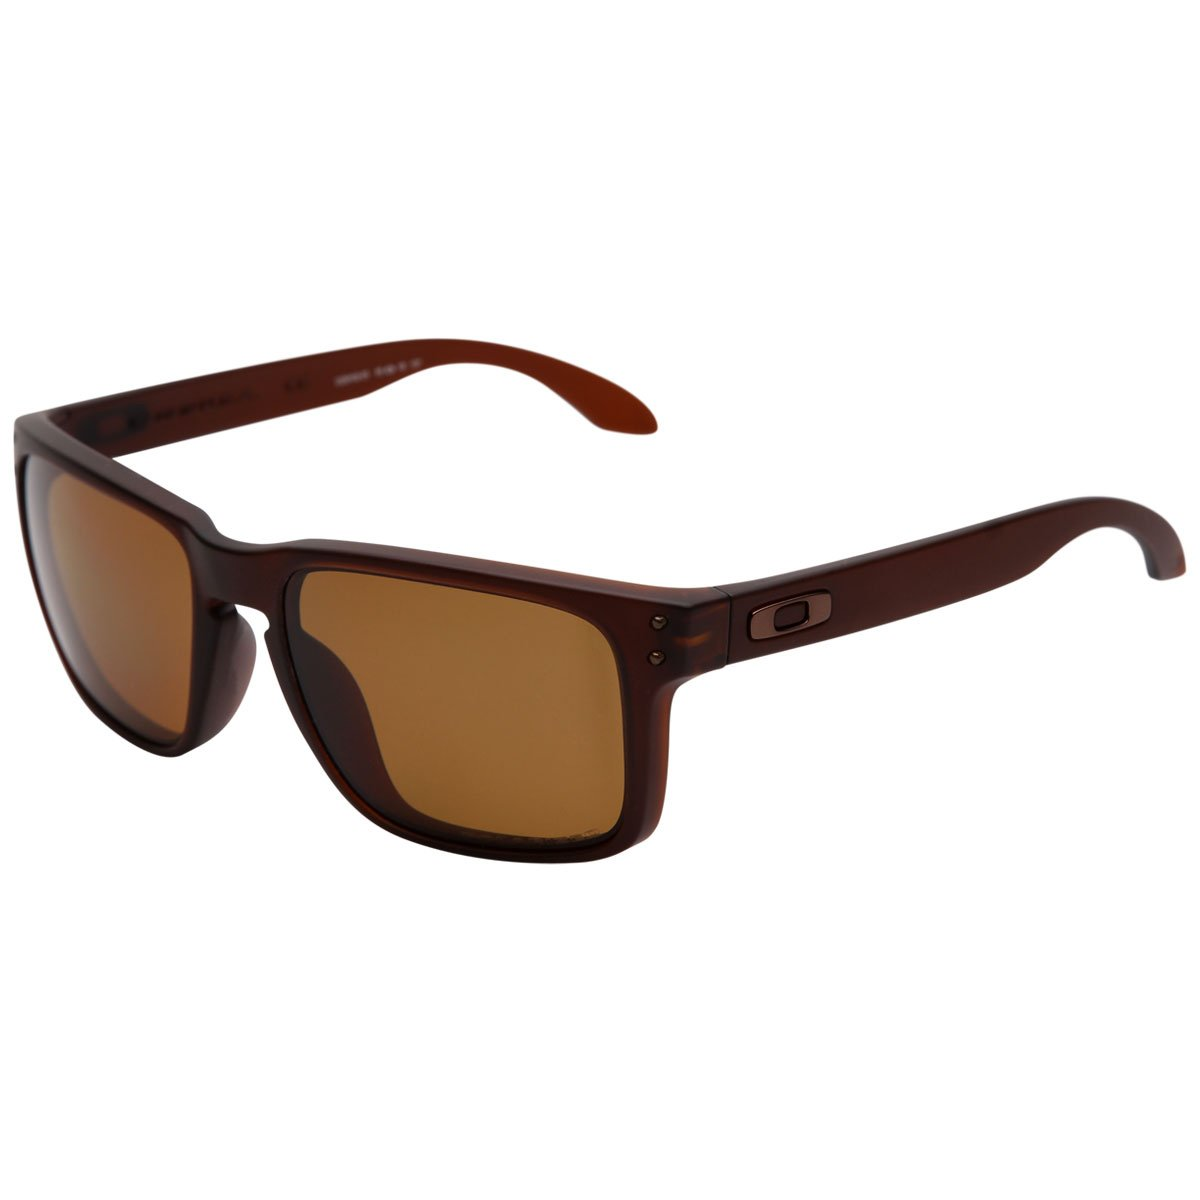 e104ce30723e2 ... Compre Agora   Dafiti Brasil Óculos Oakley Holbrook Polarizado  Masculino - Marrom